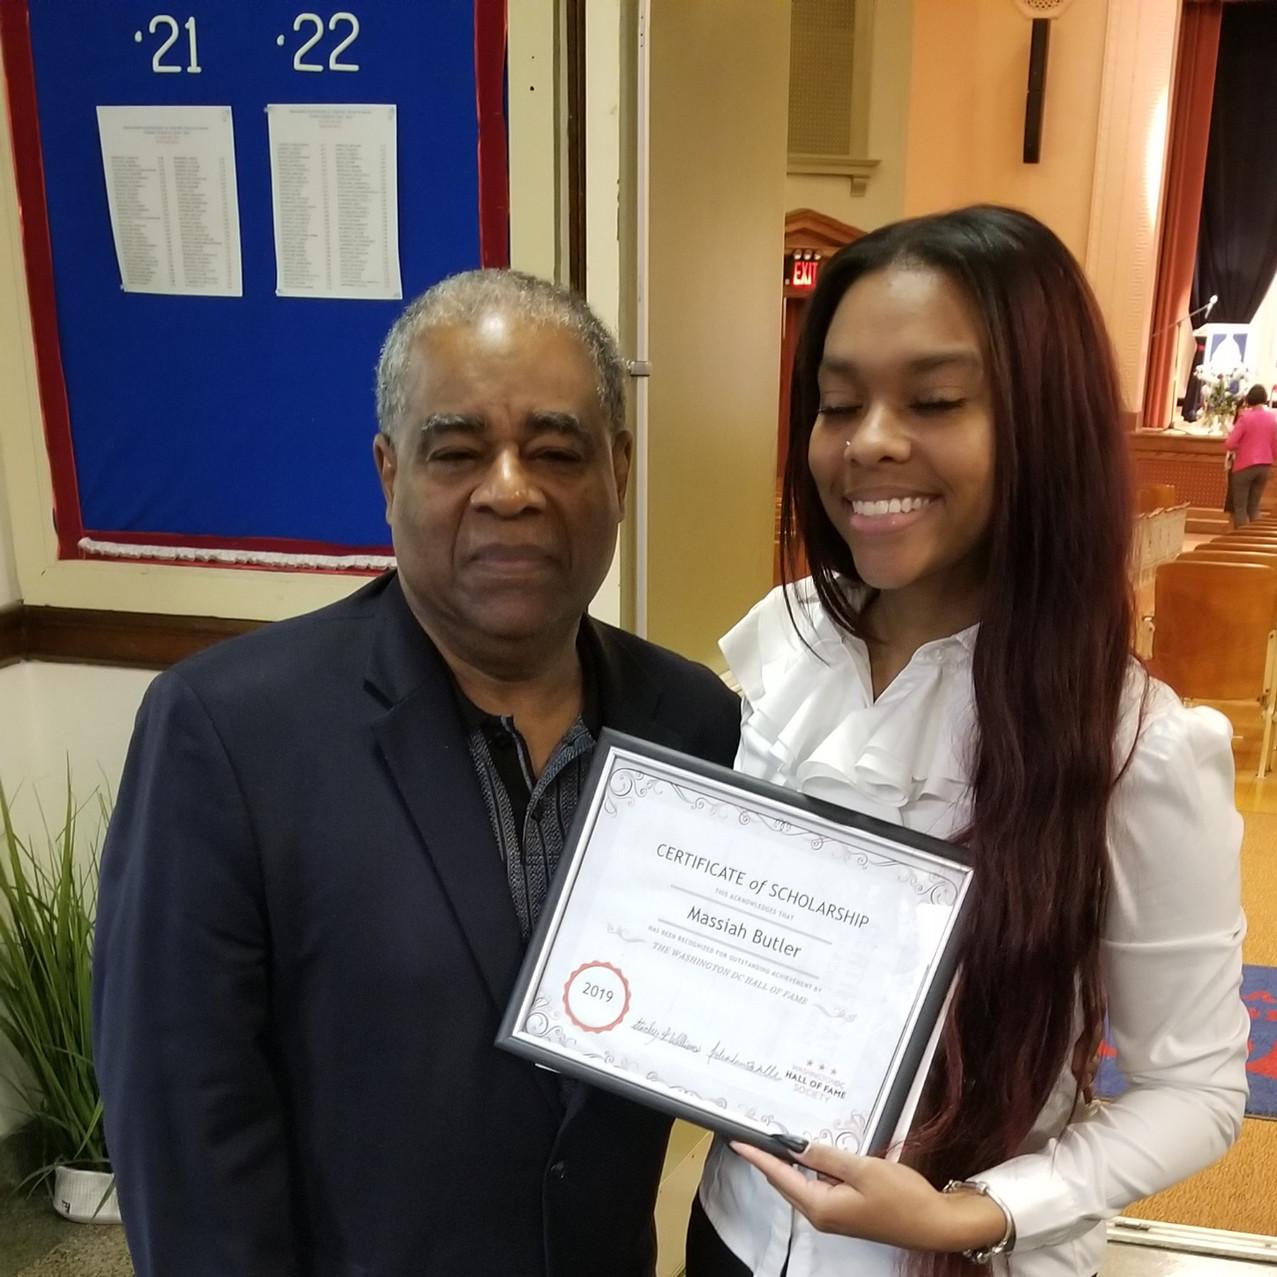 DCHOF President Stanley K. Williams with Scholarship Award Recipient, 2019